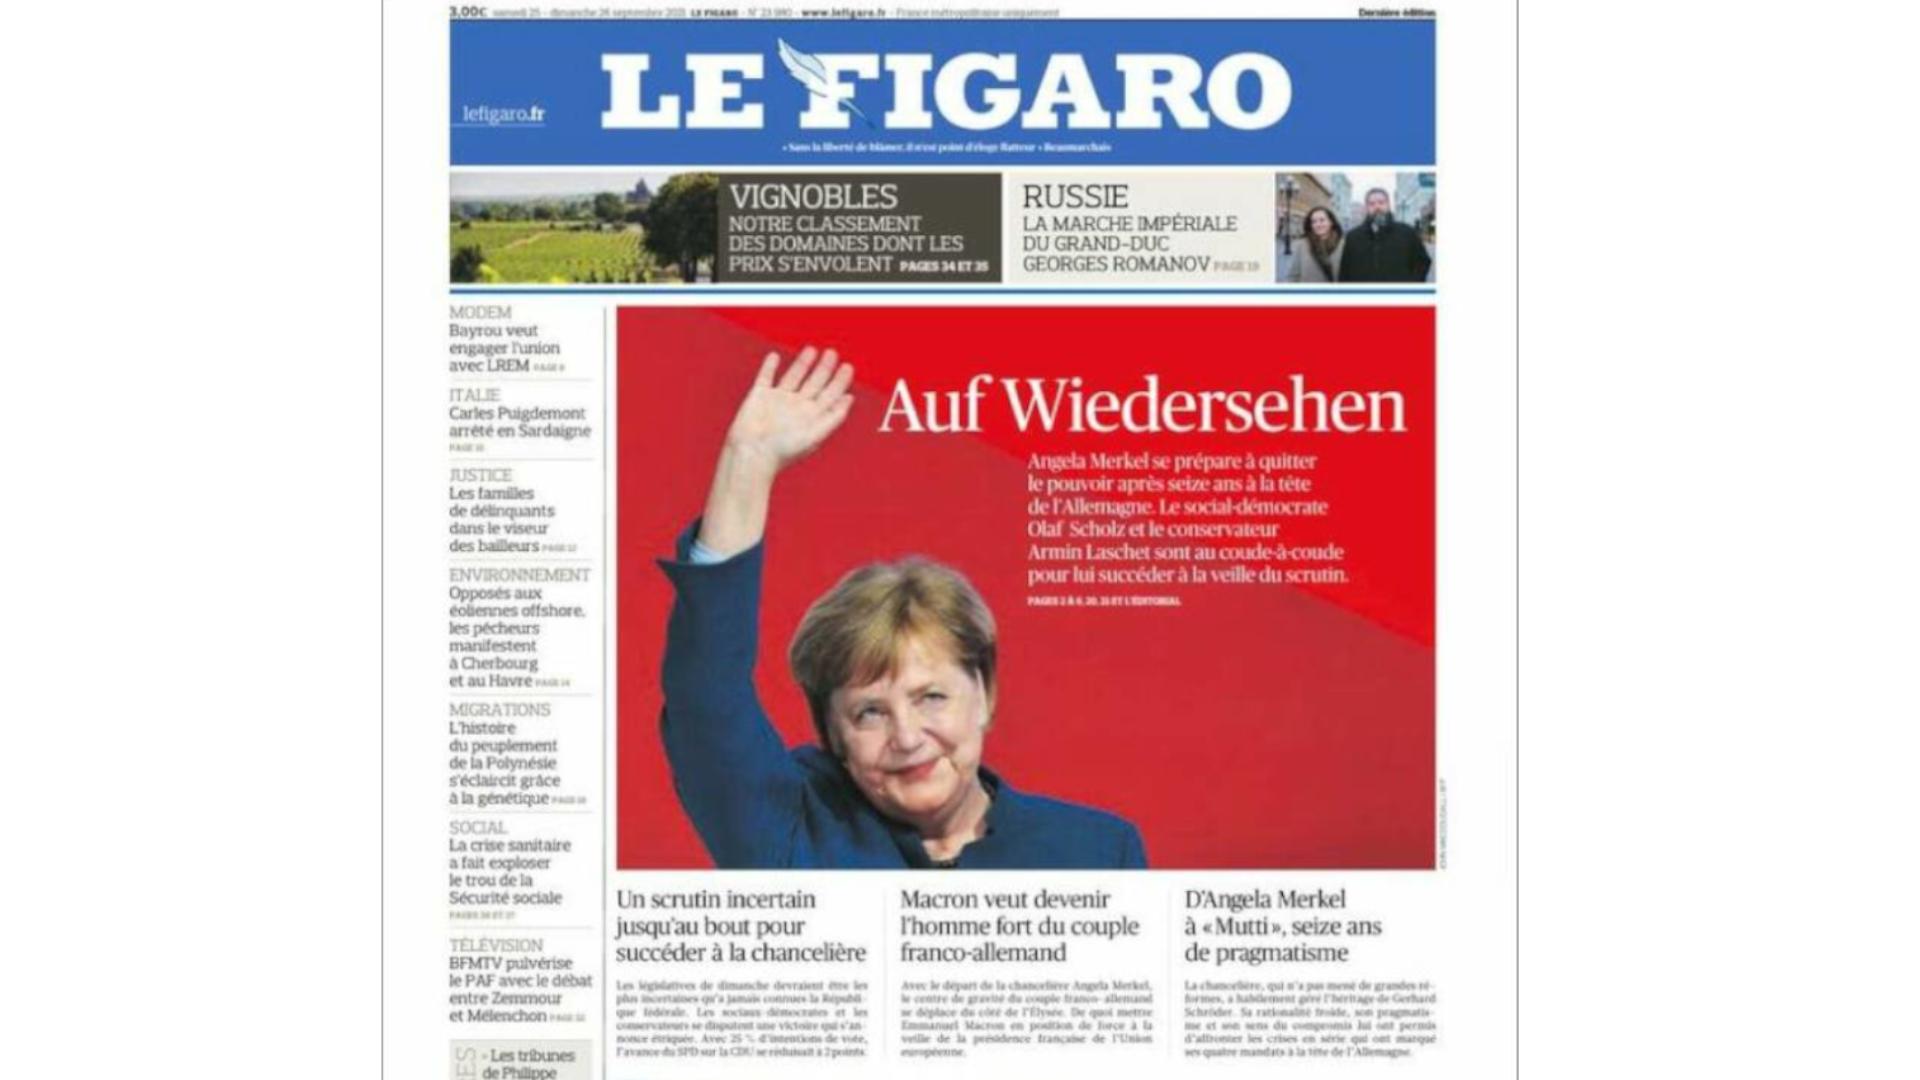 Le figaro Merkel